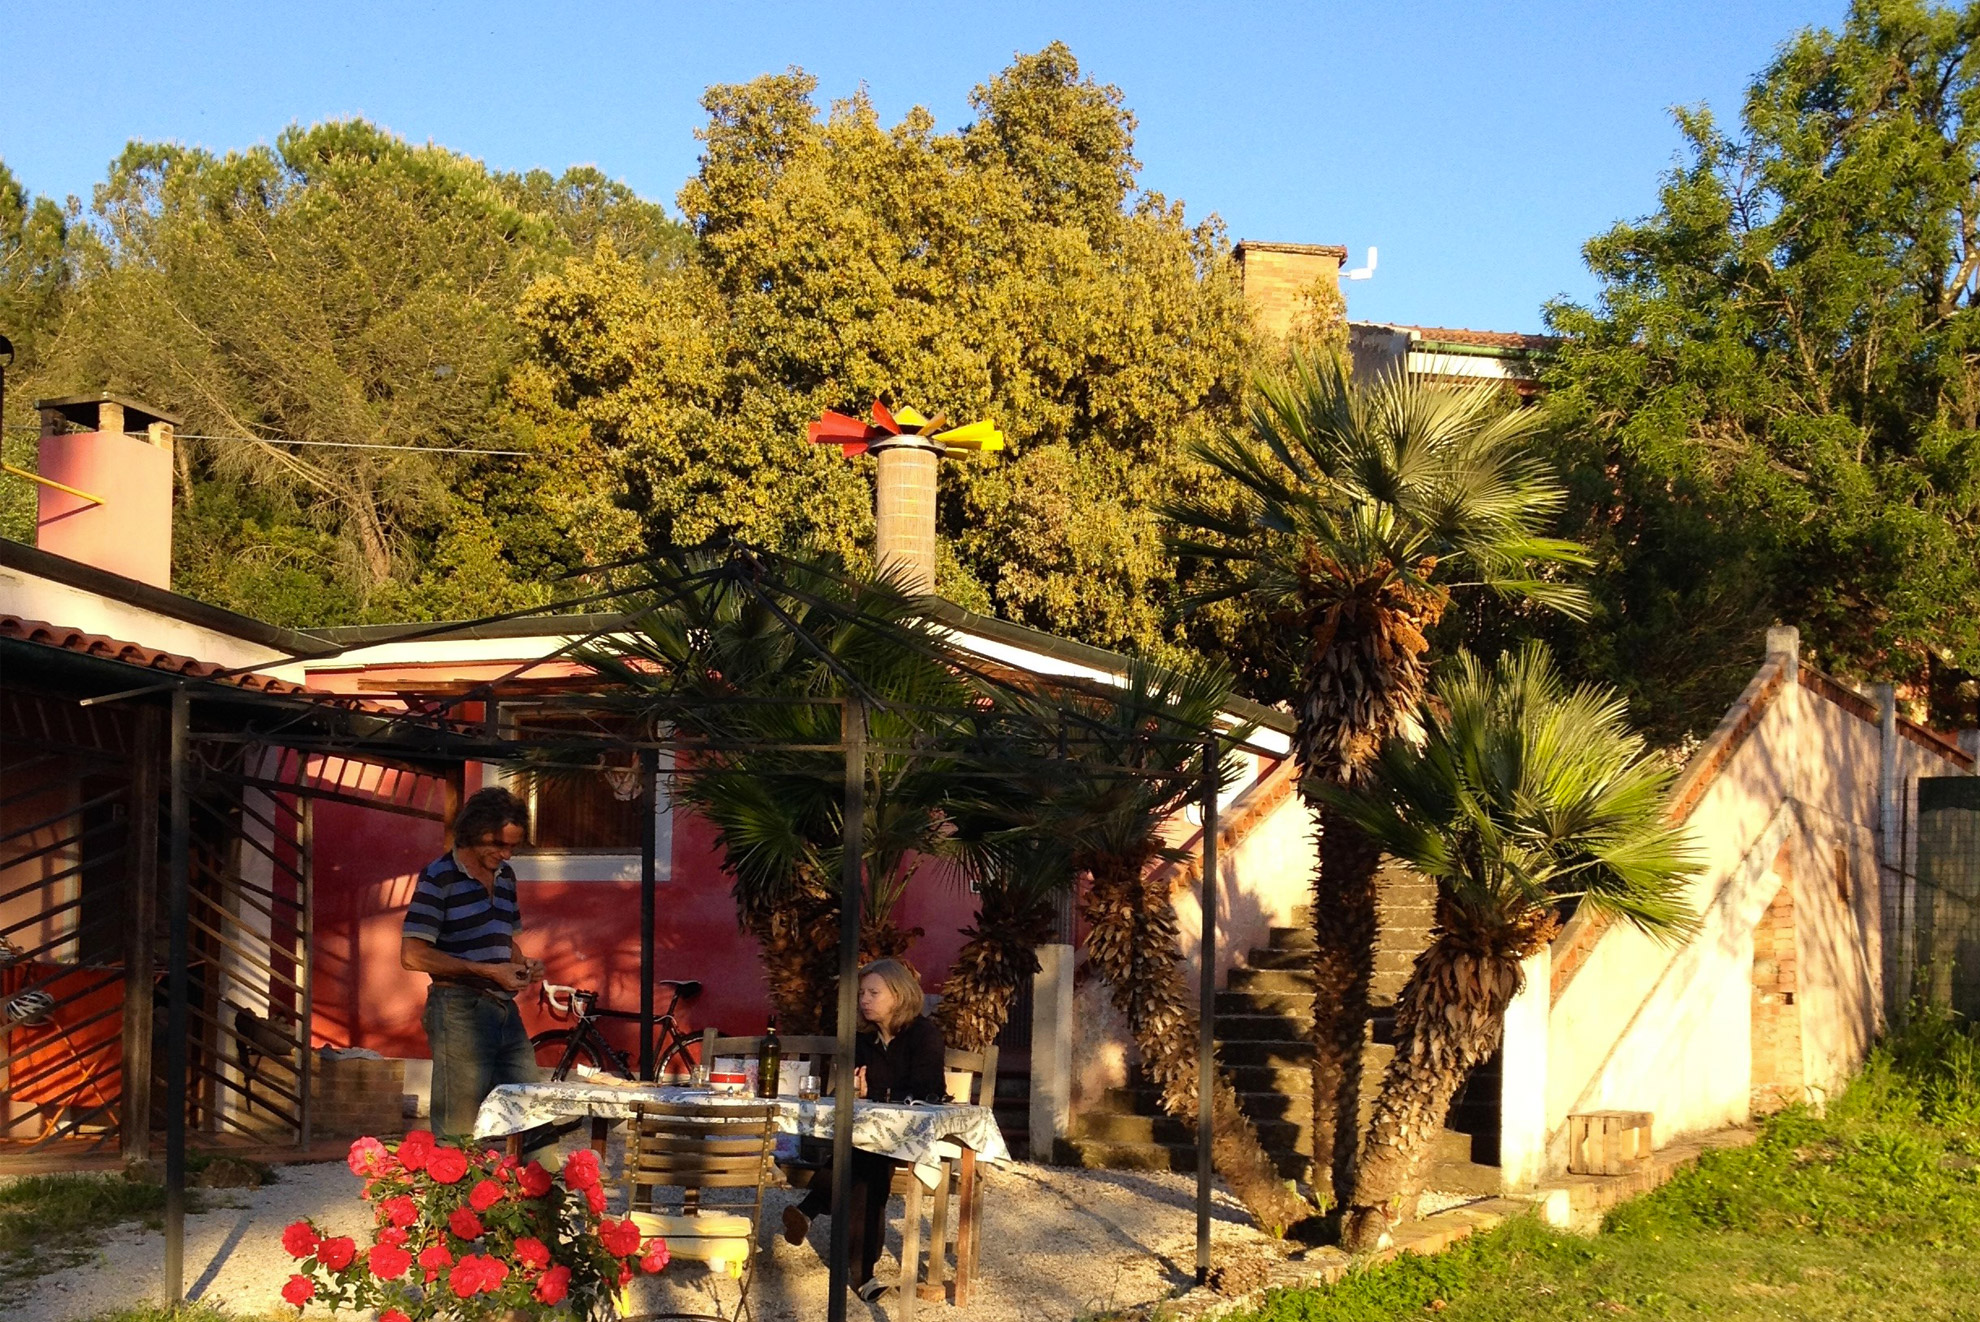 Ferienhaus Suvereto Casetta Piccola 4